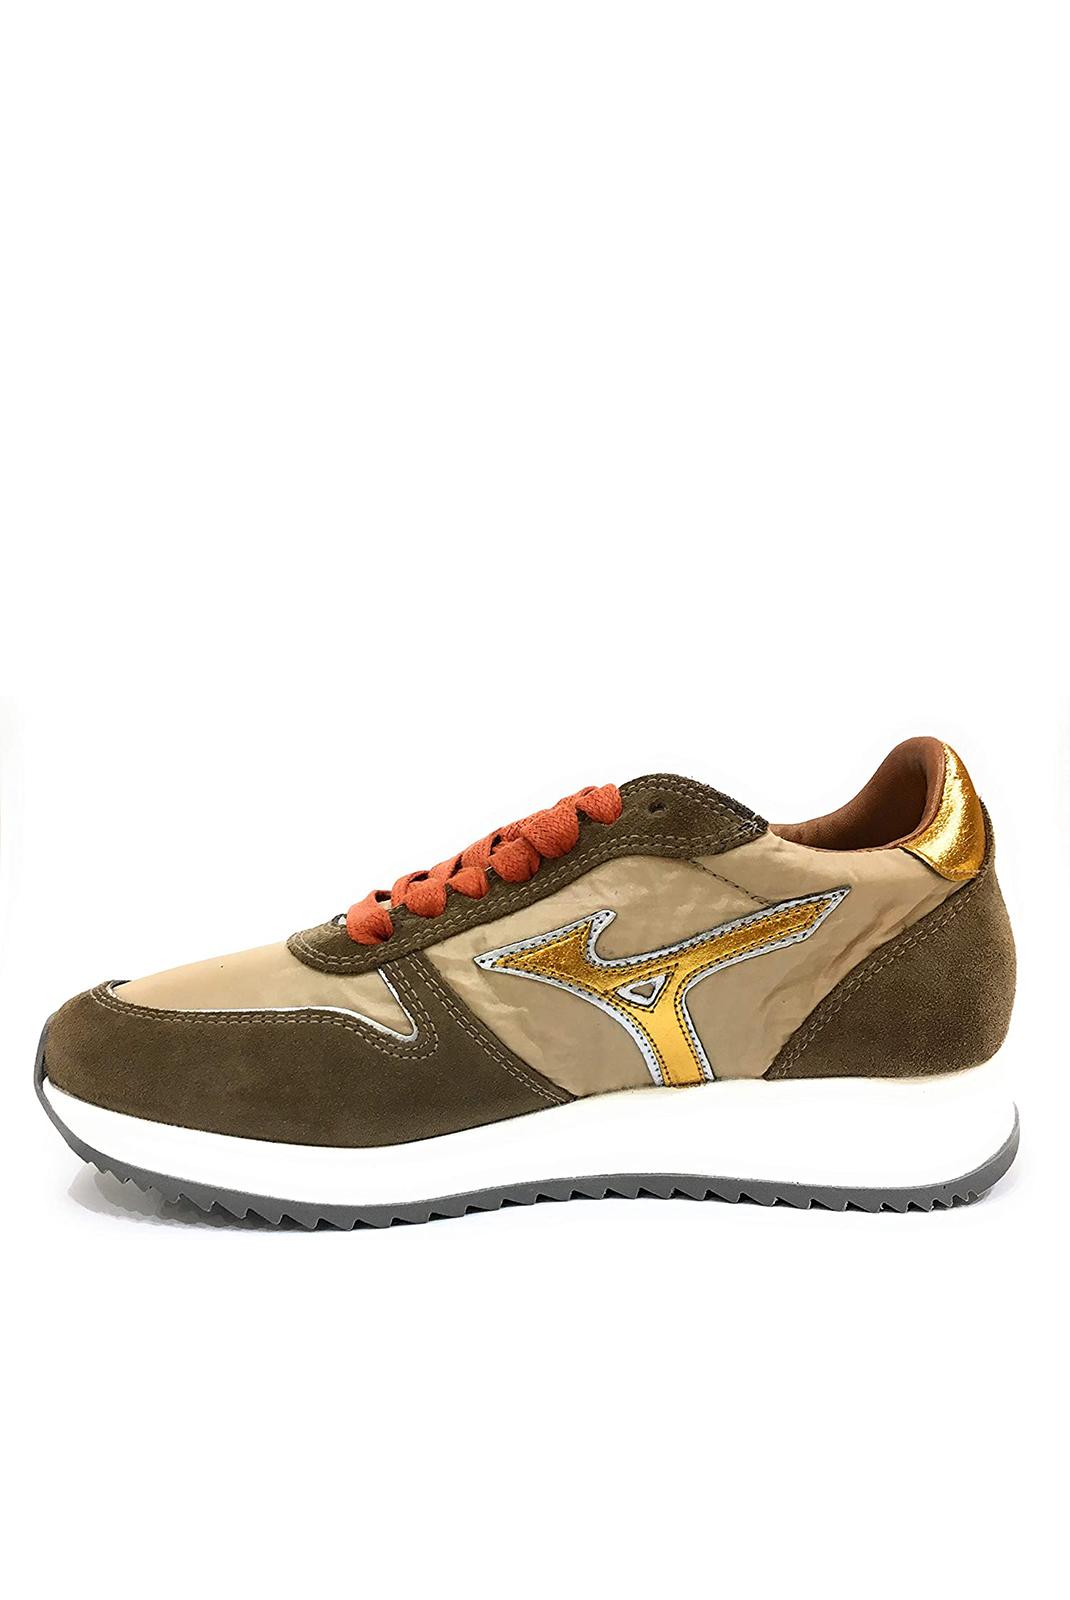 Baskets / Sneakers  Mizuno D1GE181352 ETAMIN 2  GOLD/TABACC